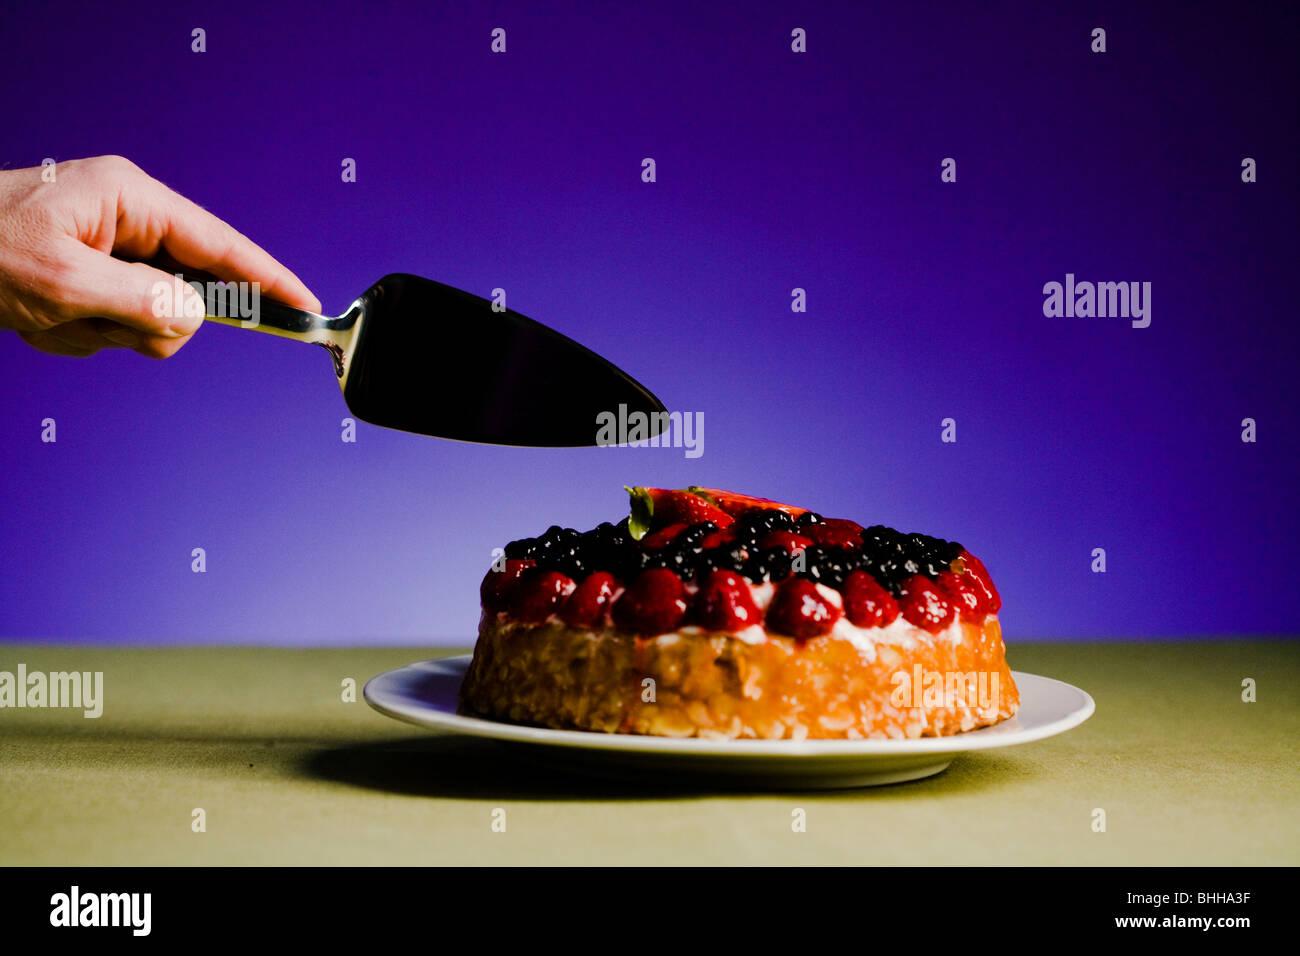 Cake against a blue background, Sweden. - Stock Image